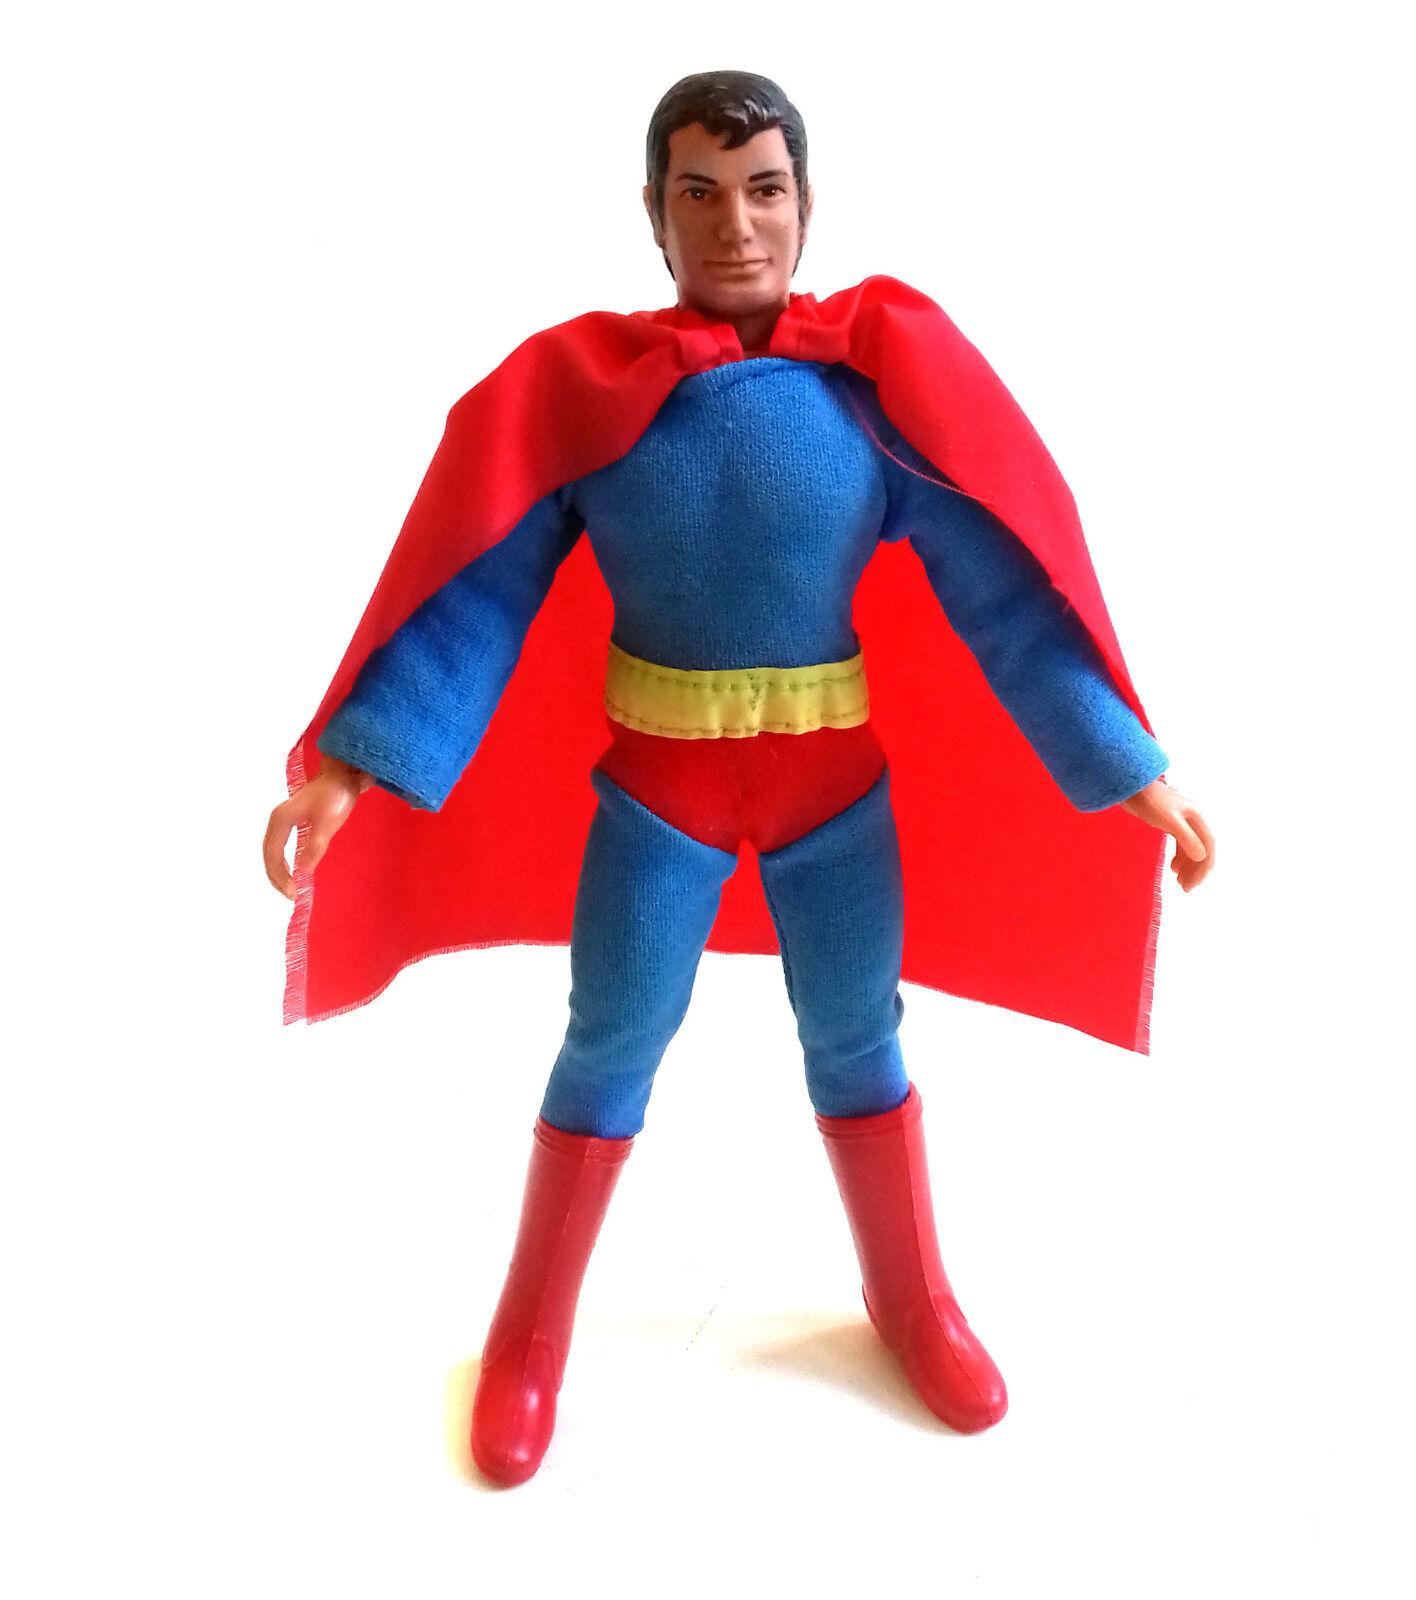 Dc comics vintage mego spielzeug superman superhelden - 8